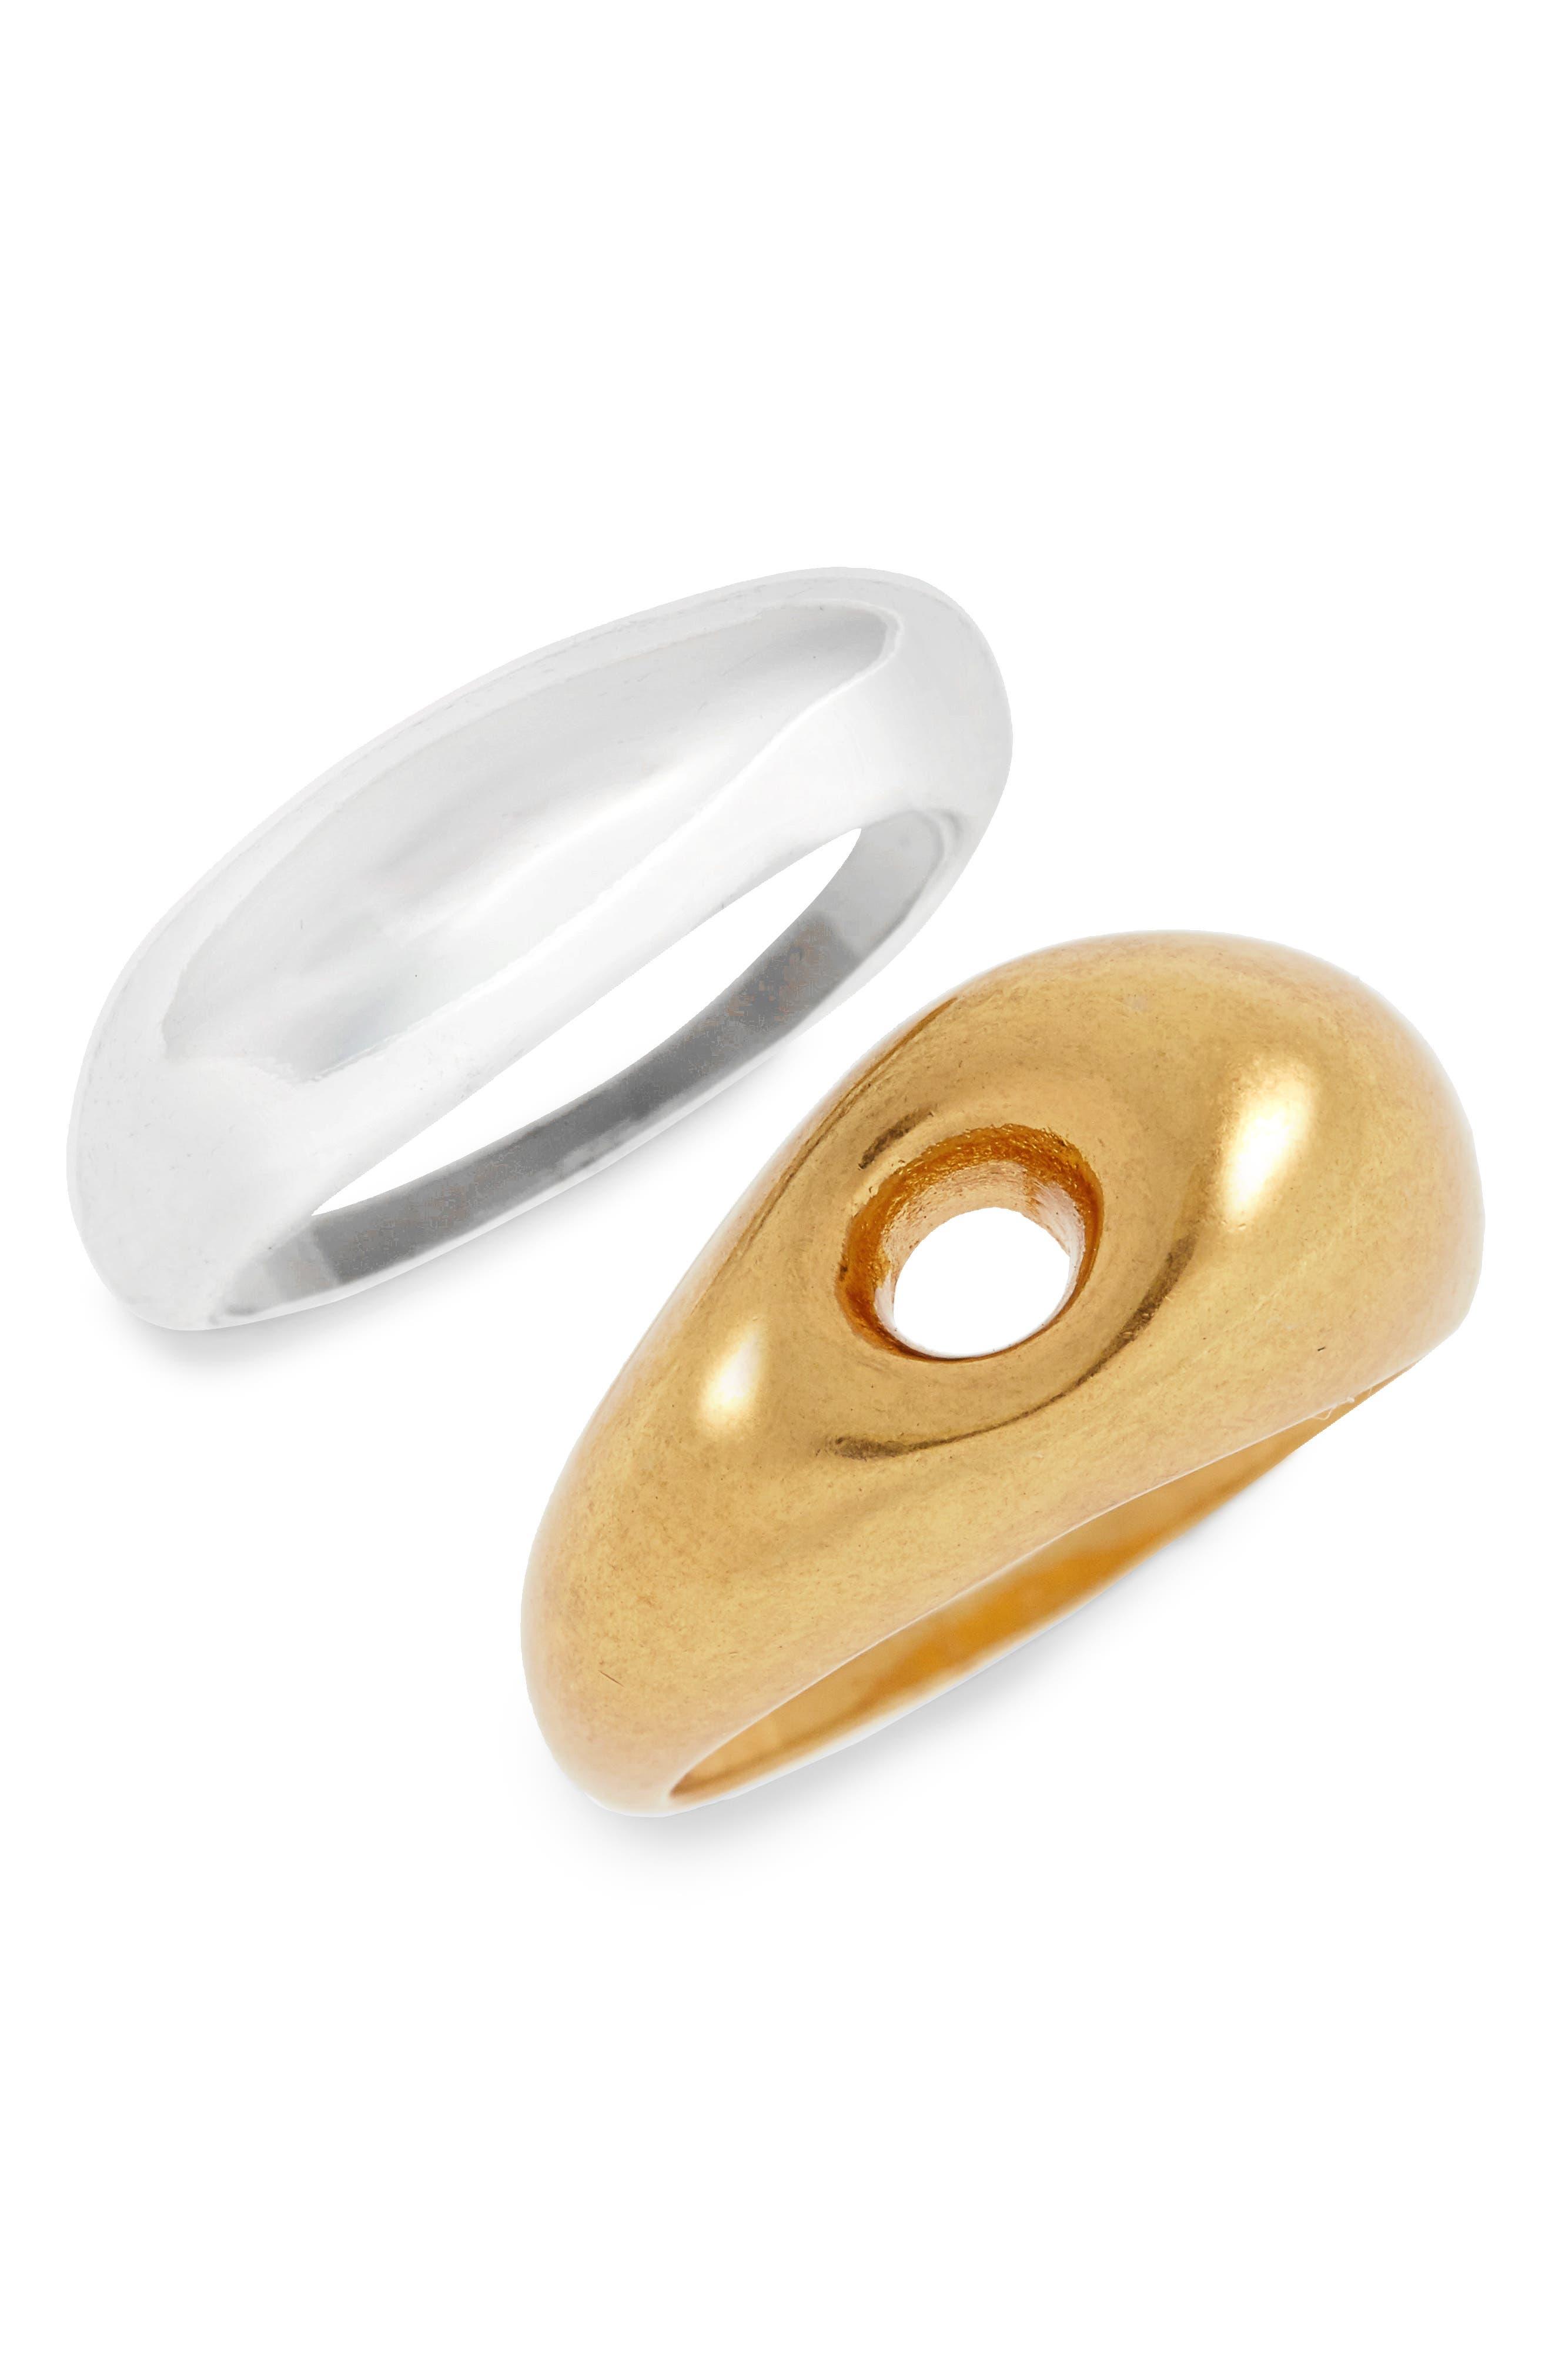 Main Image - Madewell Sestine Set of 2 Rings